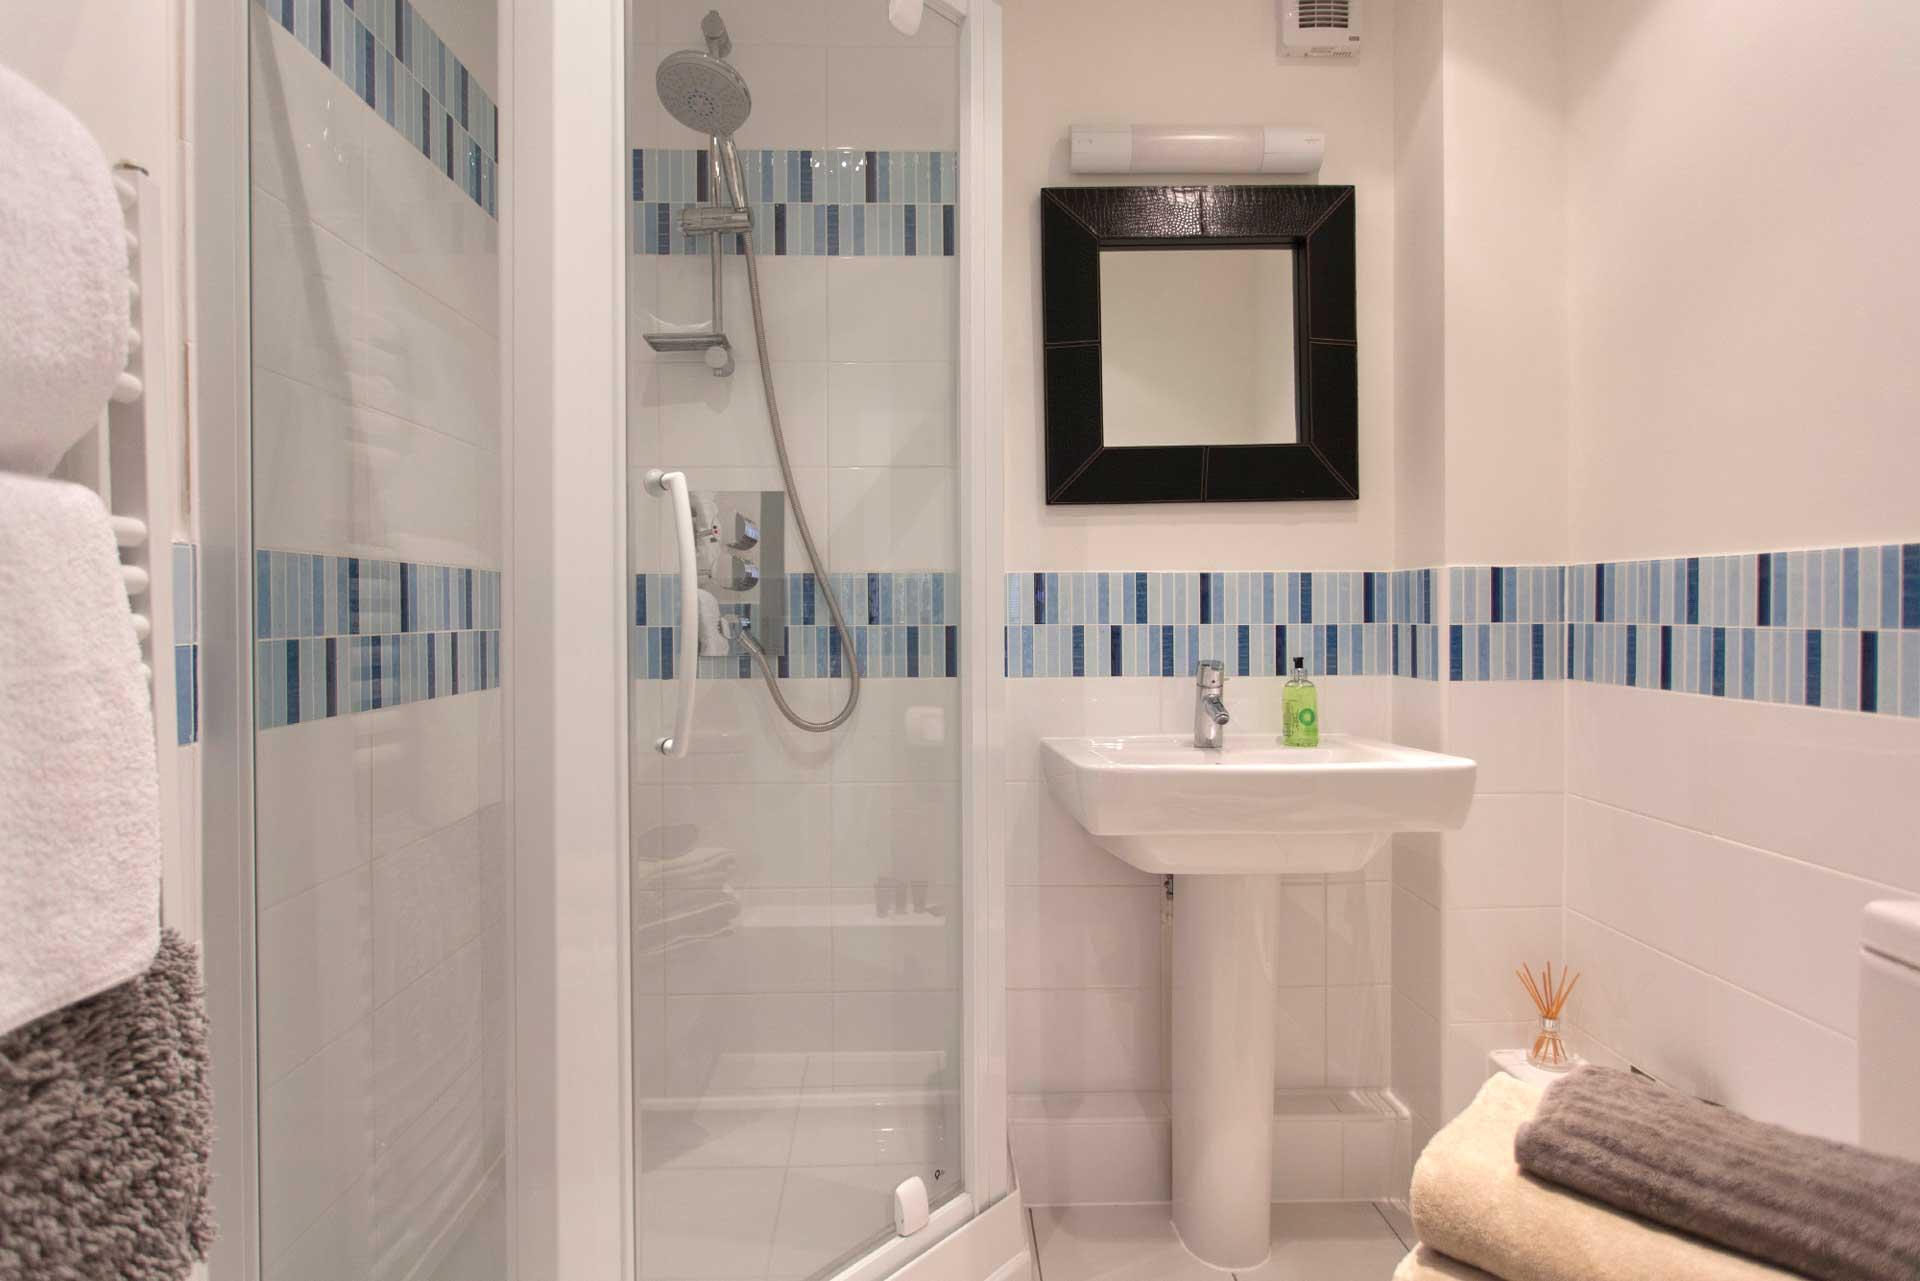 Howells-Mere-3-Lower-Mill-Estate-Rentals-Bathroom-2a